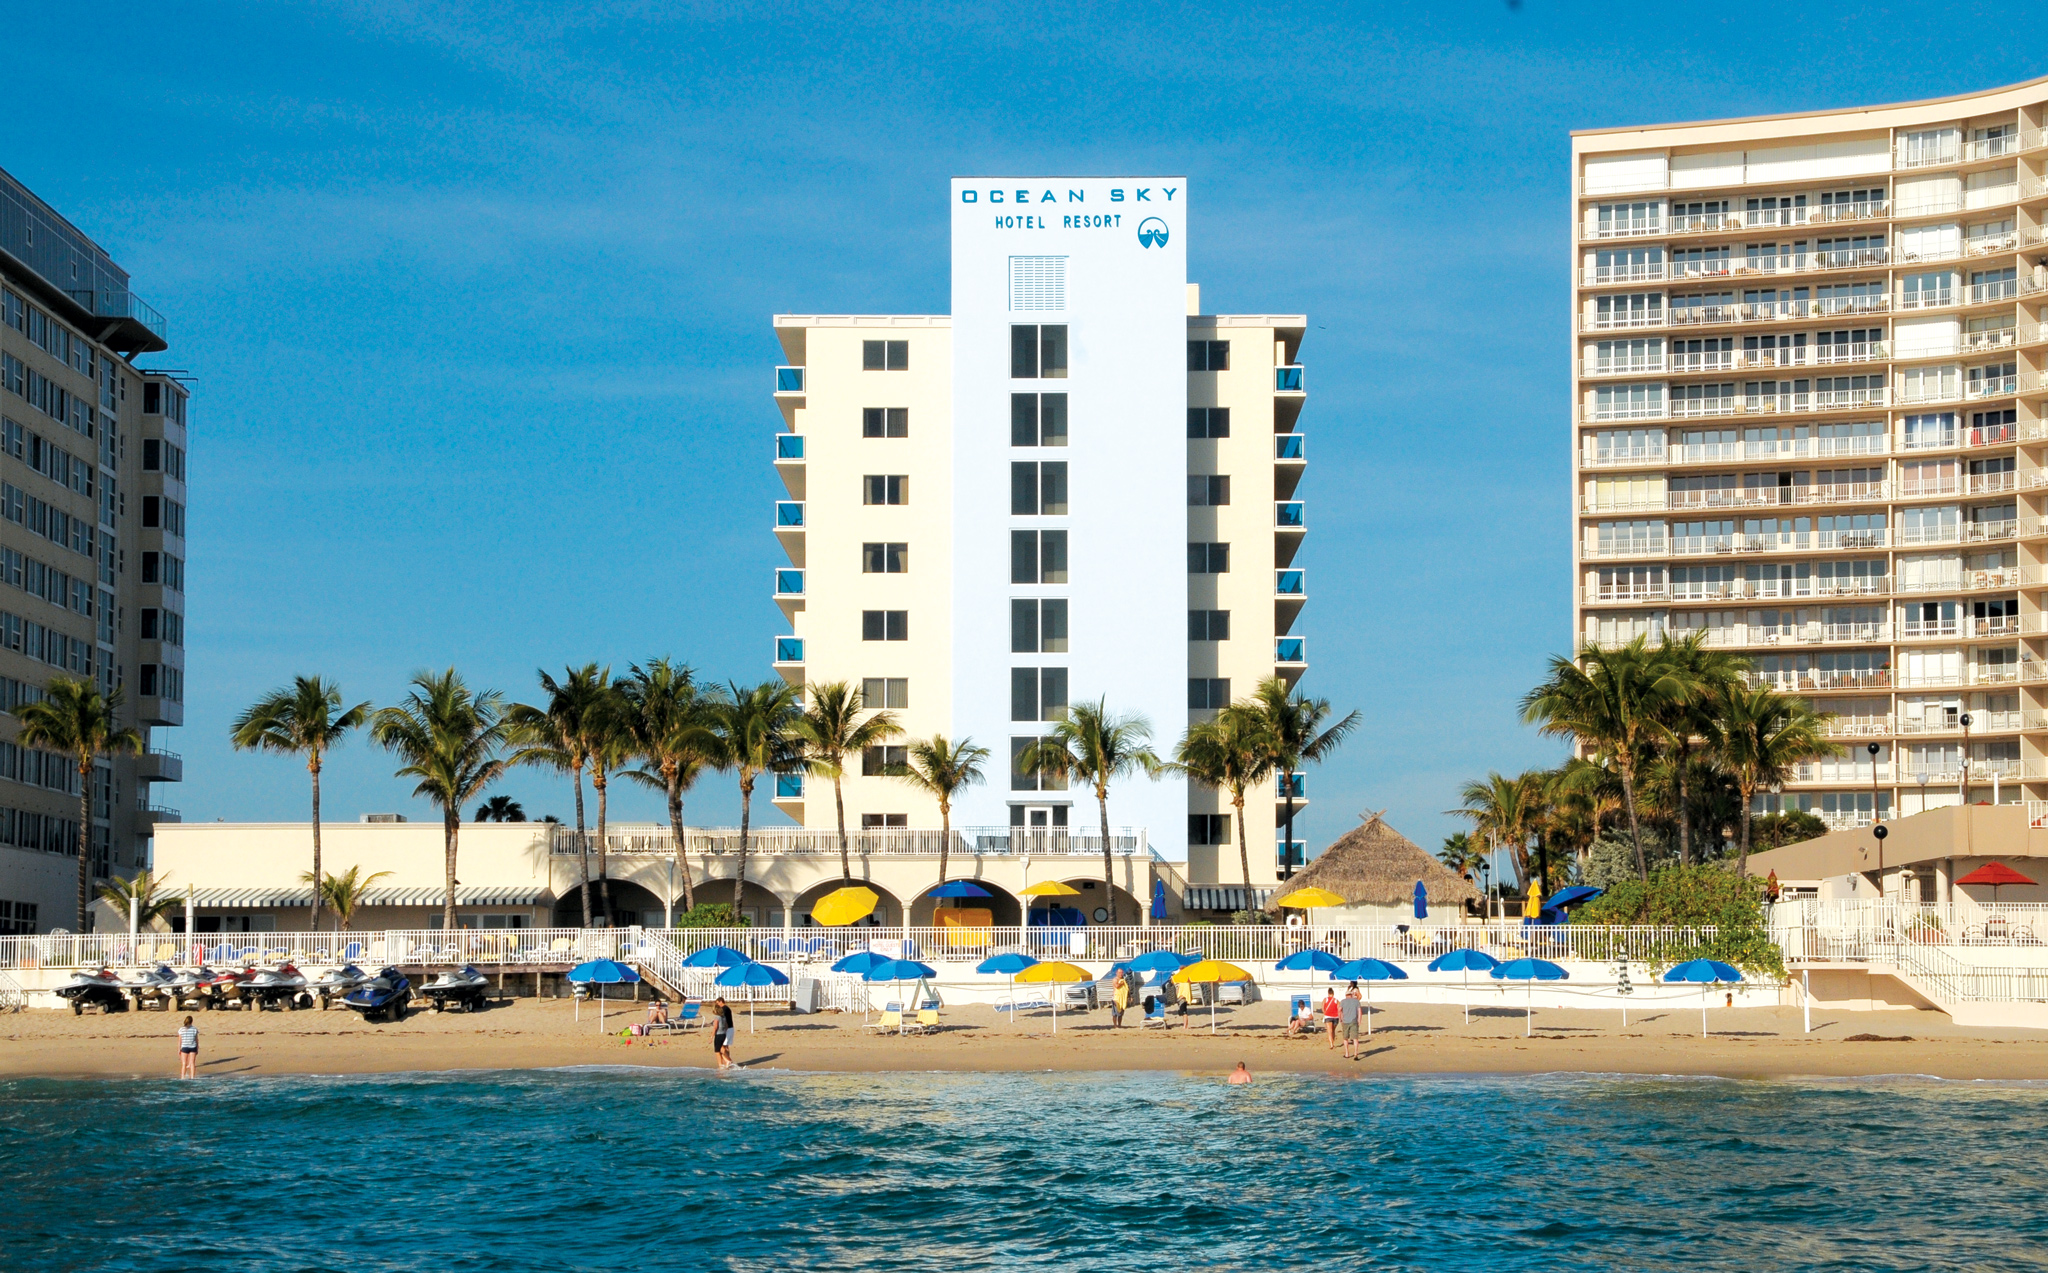 Ocean Sky Hotel And Resort - Fort Lauderdale Transat